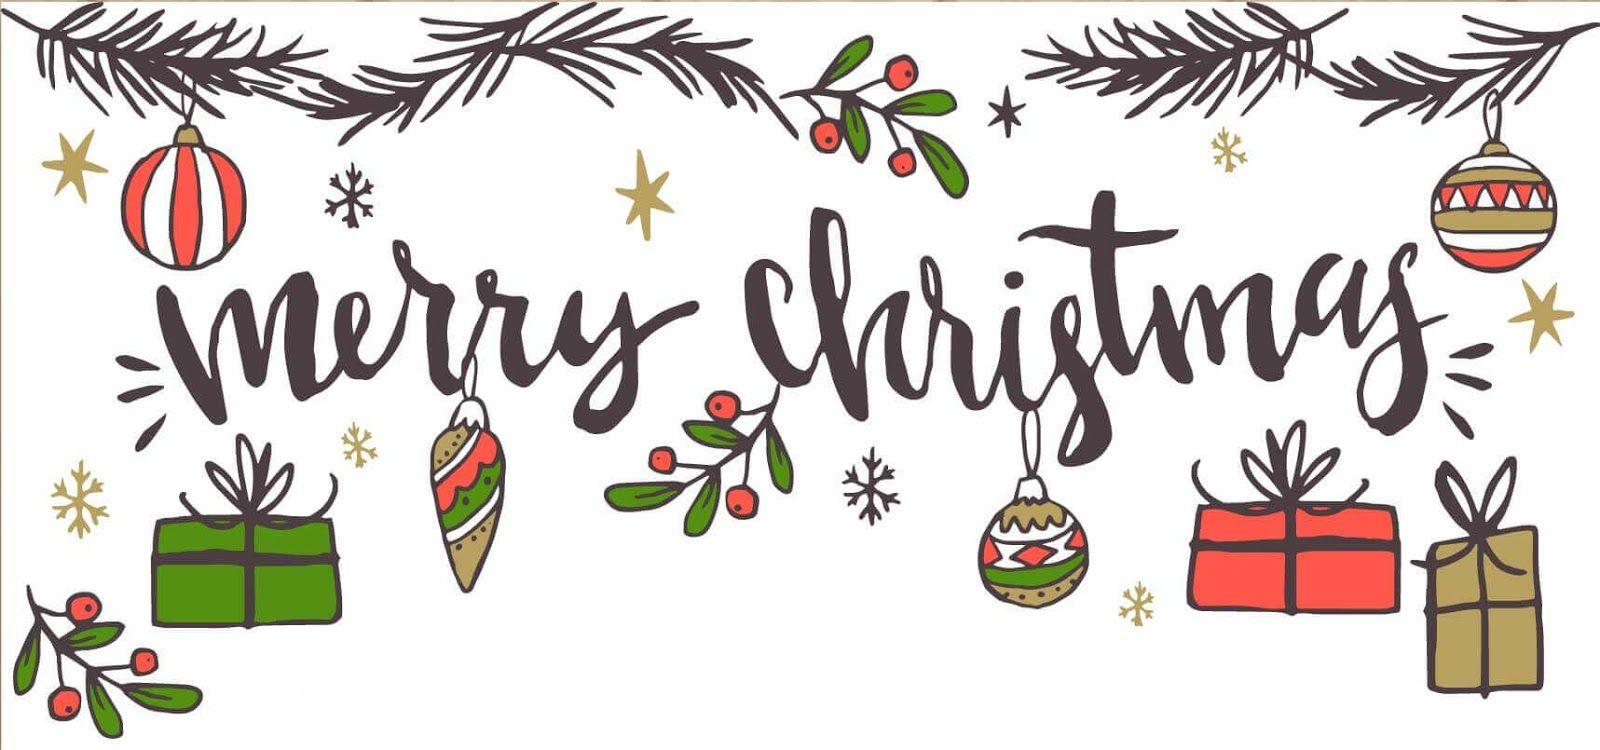 Free Merry Christmas Banner Merry Christmas Printable Banner Download Merry Christmas Printable Christmas Banners Christmas Facebook Cover